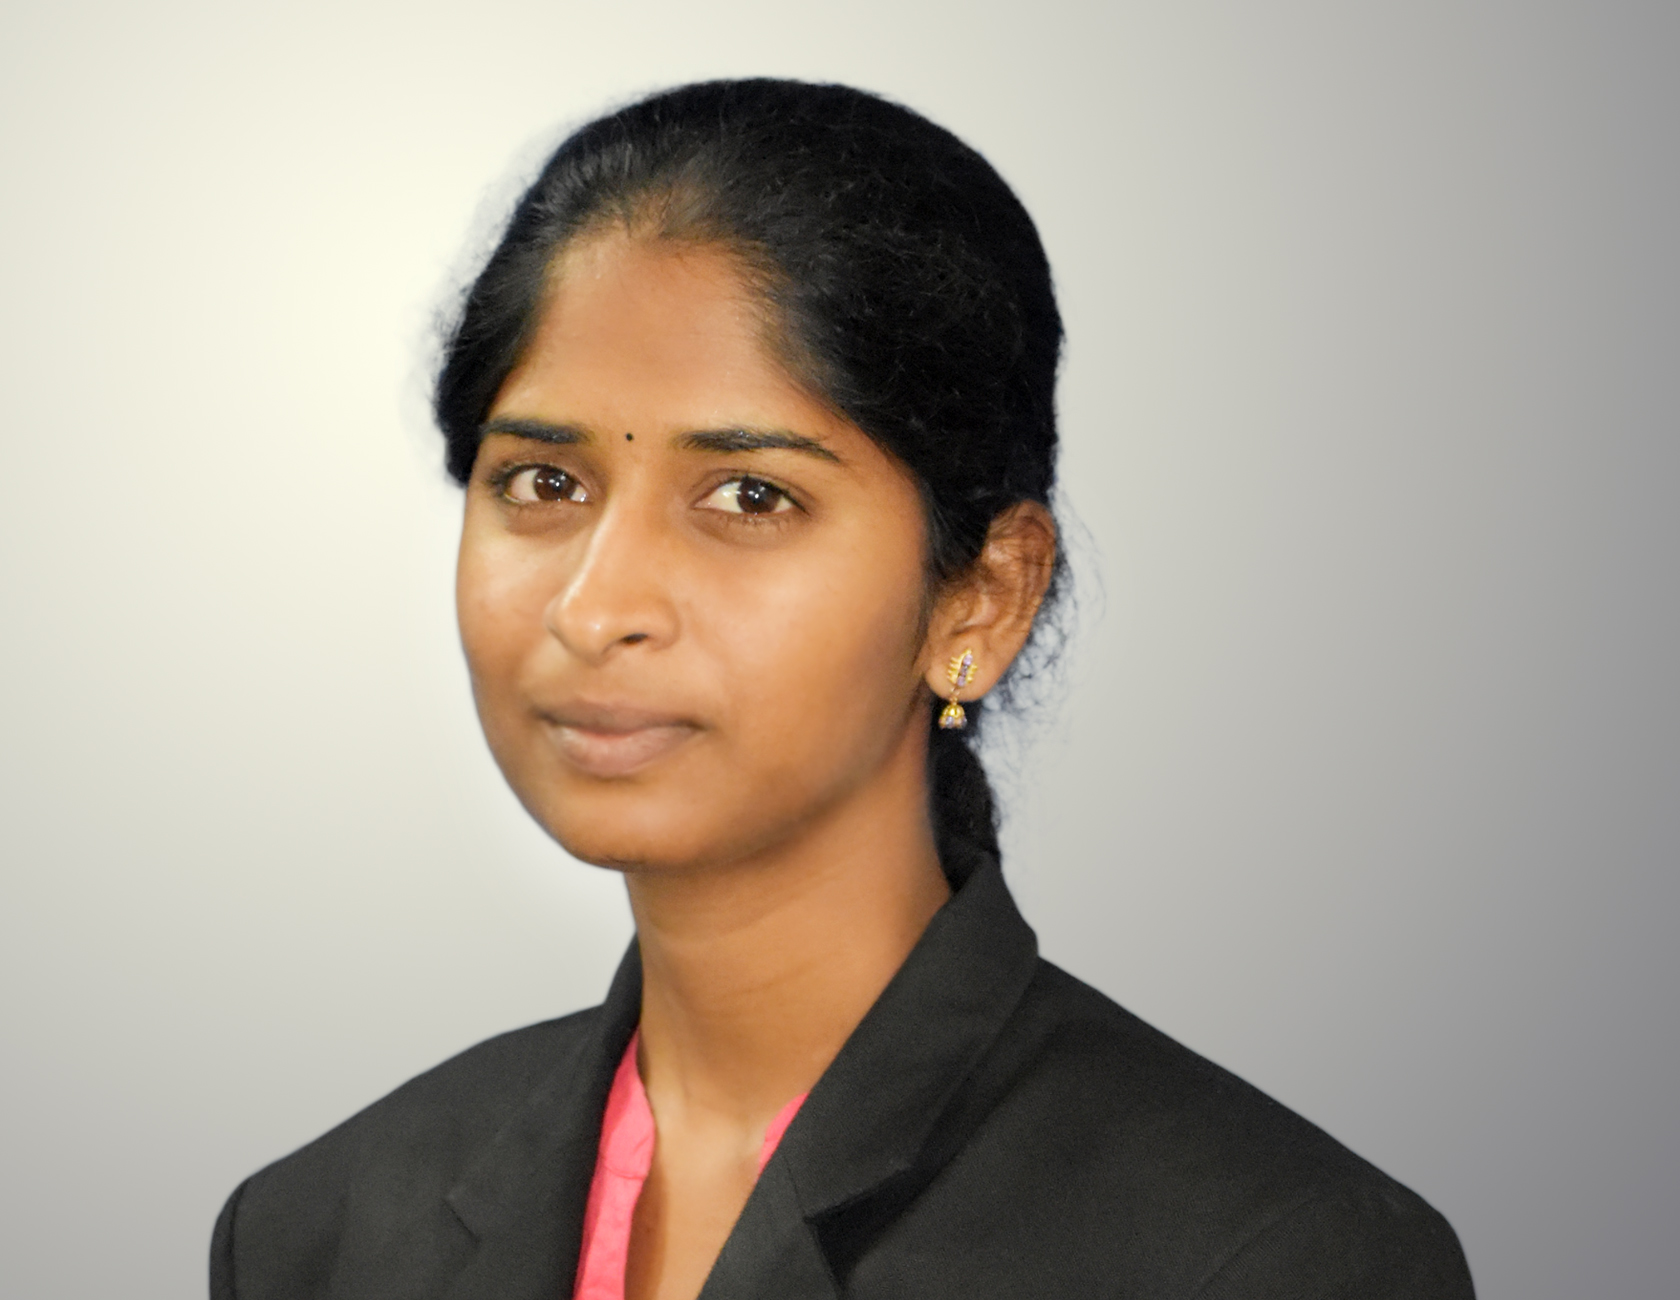 Swaroopa Nadugouni